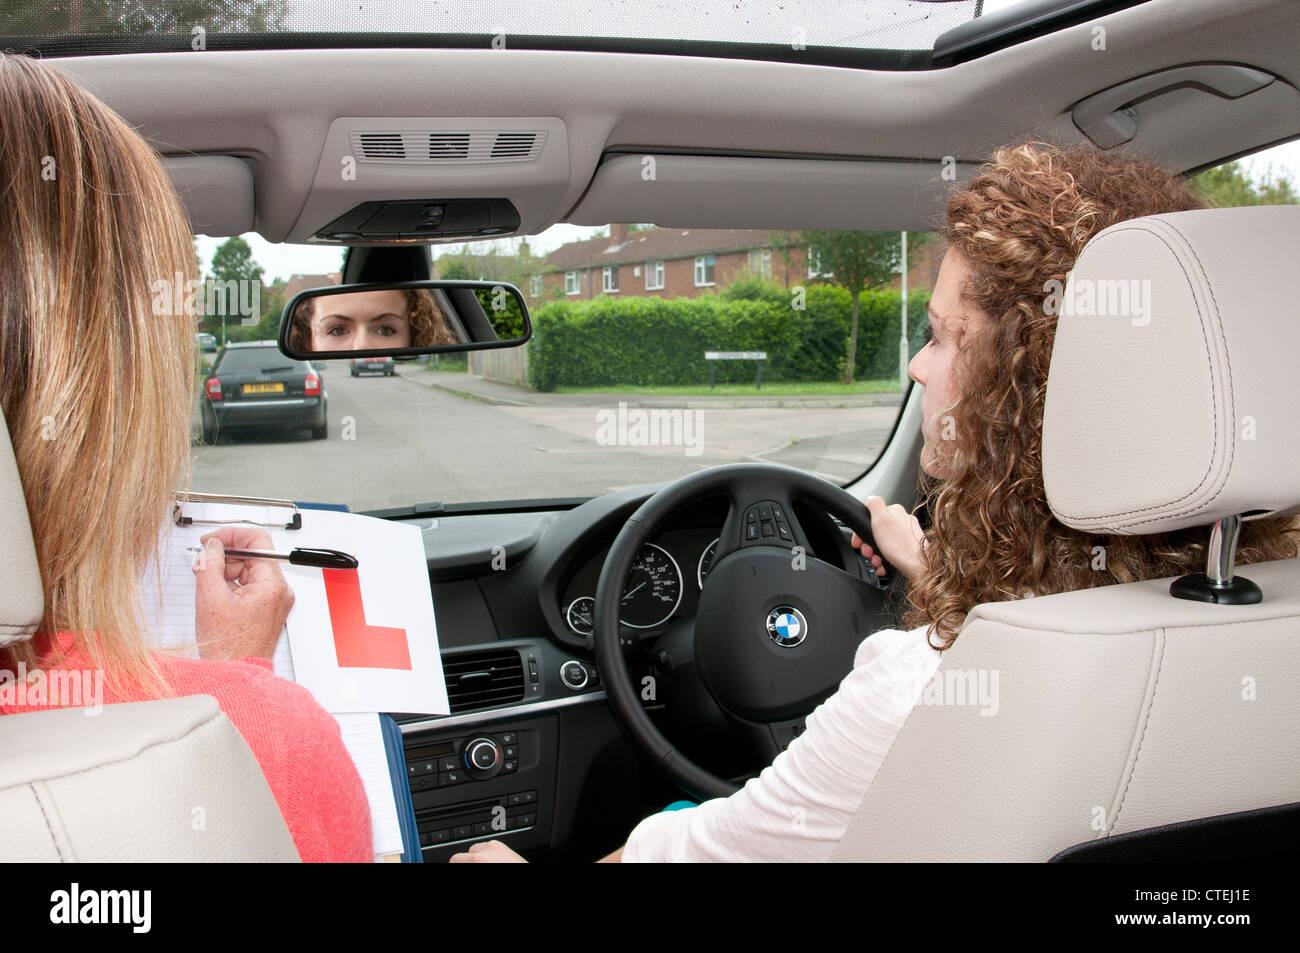 driver under instruction plates melbourne